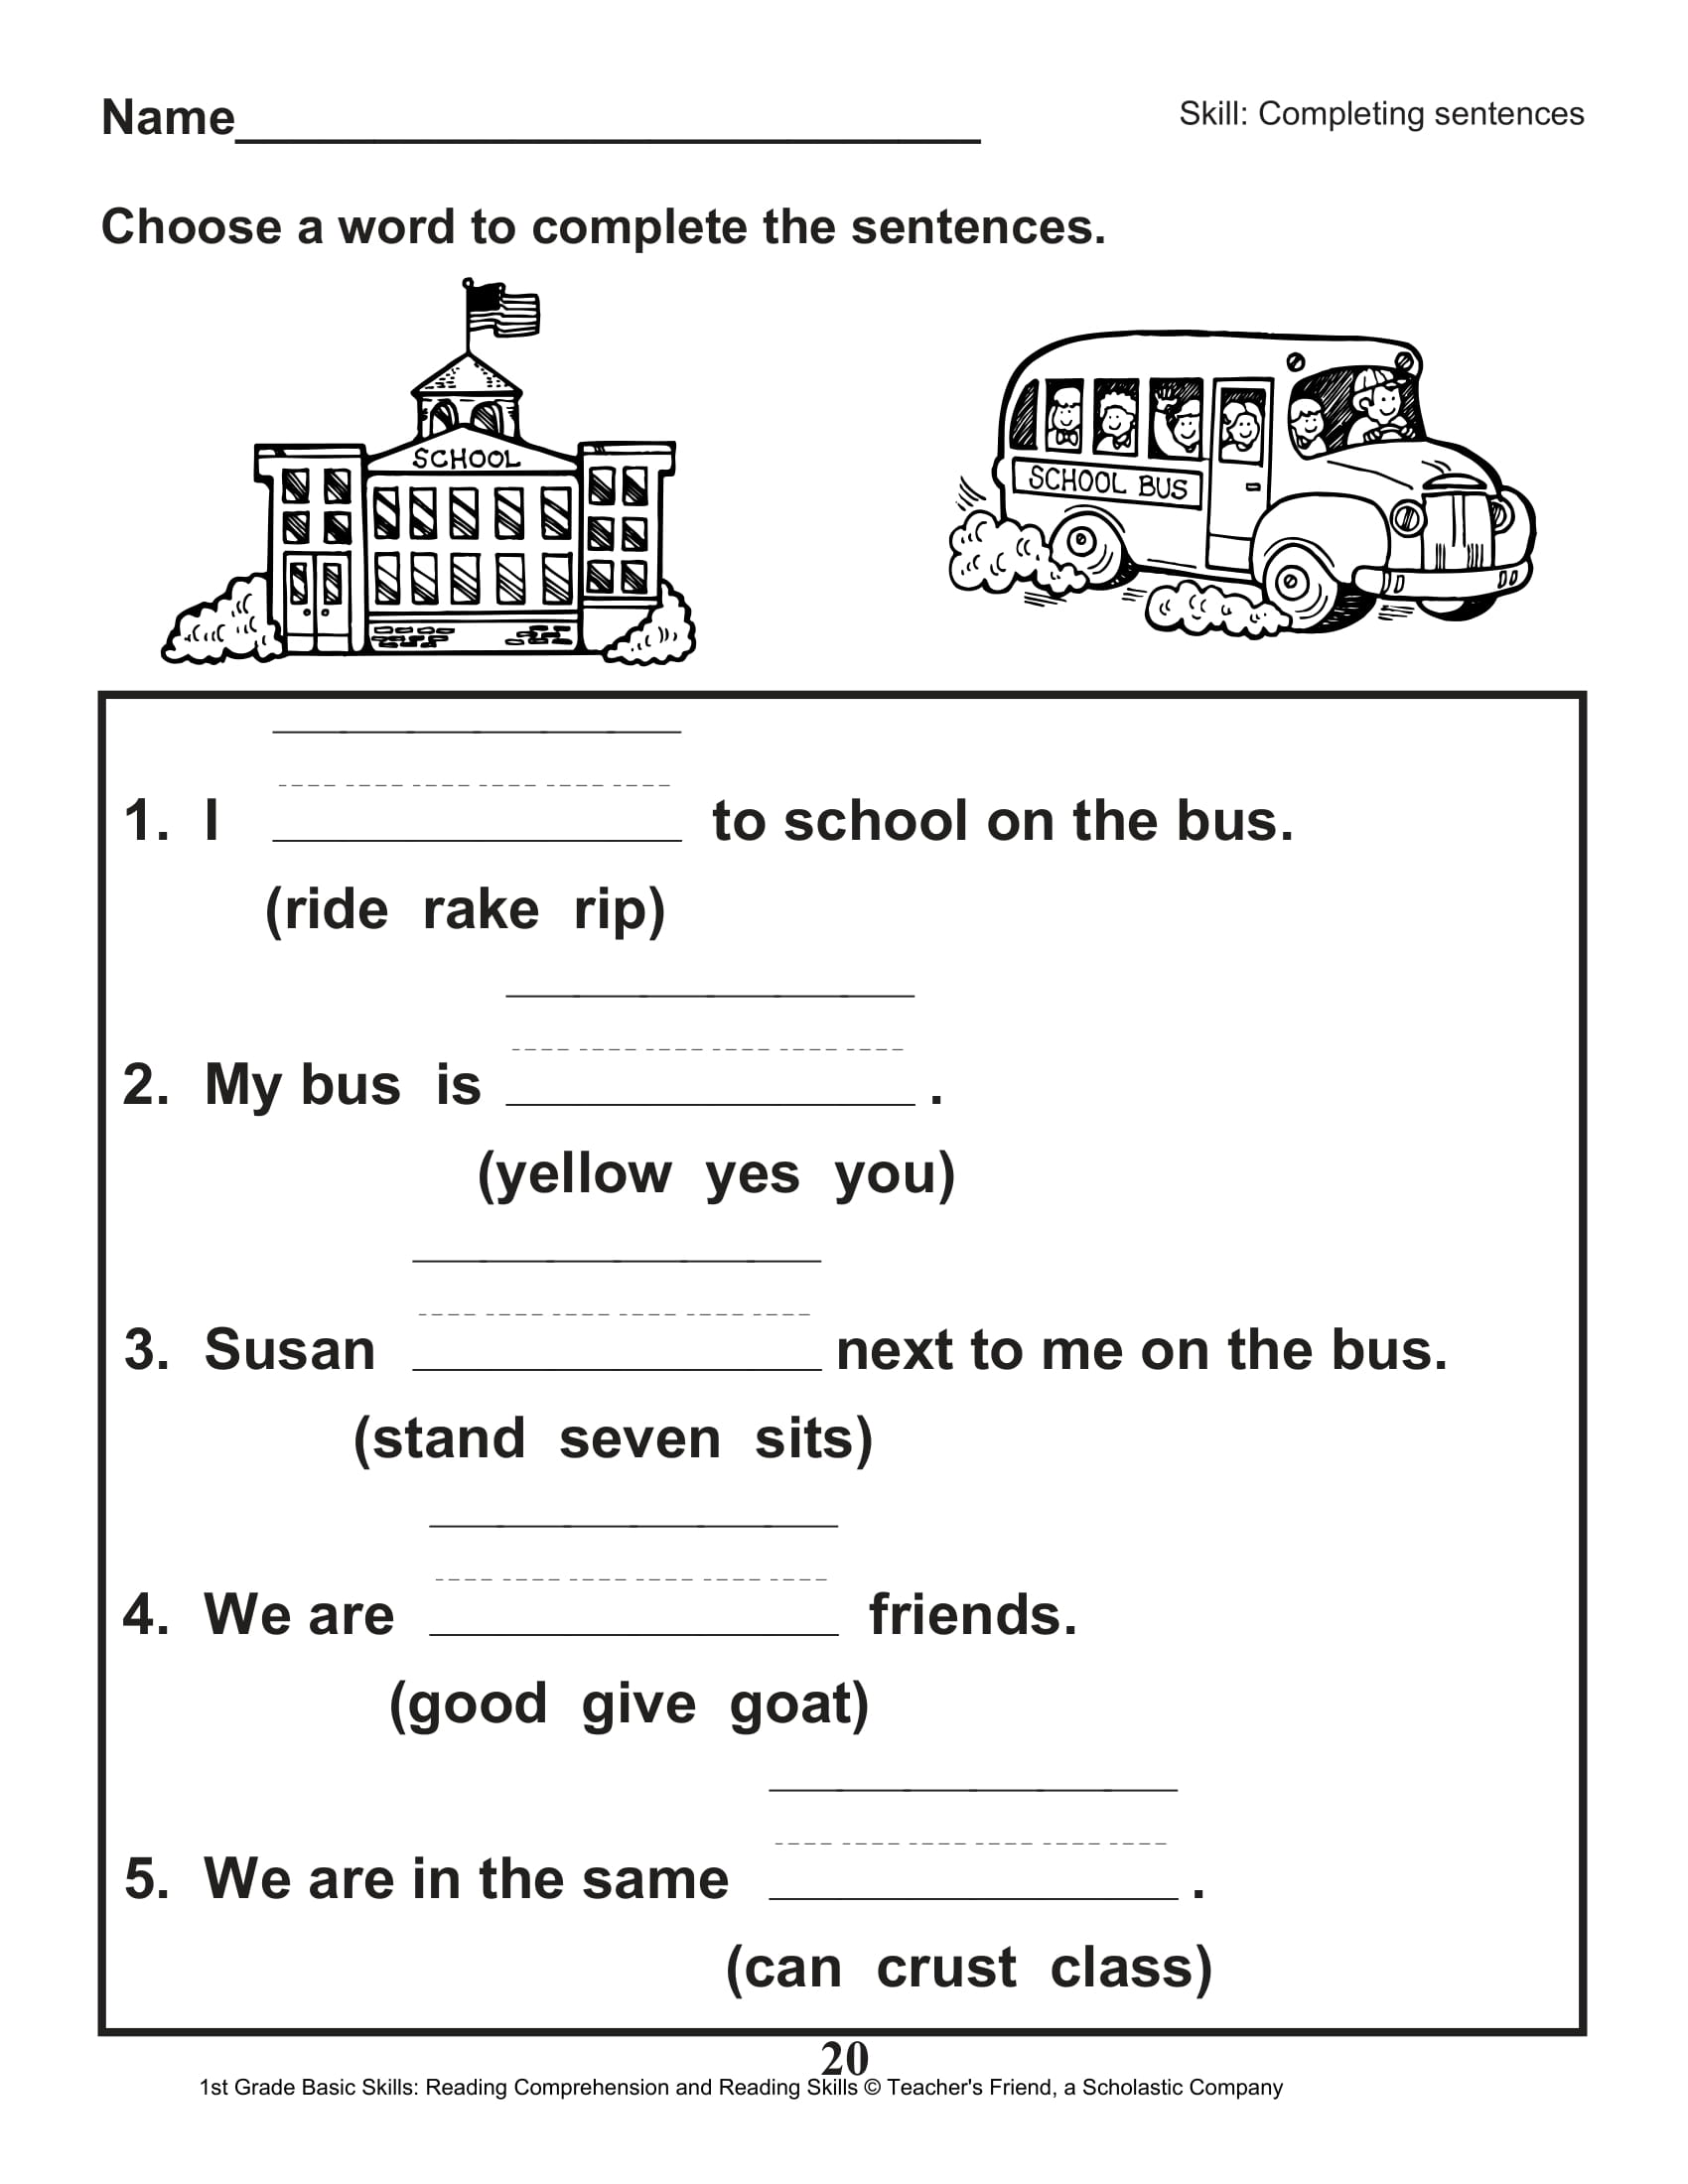 40 Scholastic 1st Grade Reading Comprehension Skills Worksheets